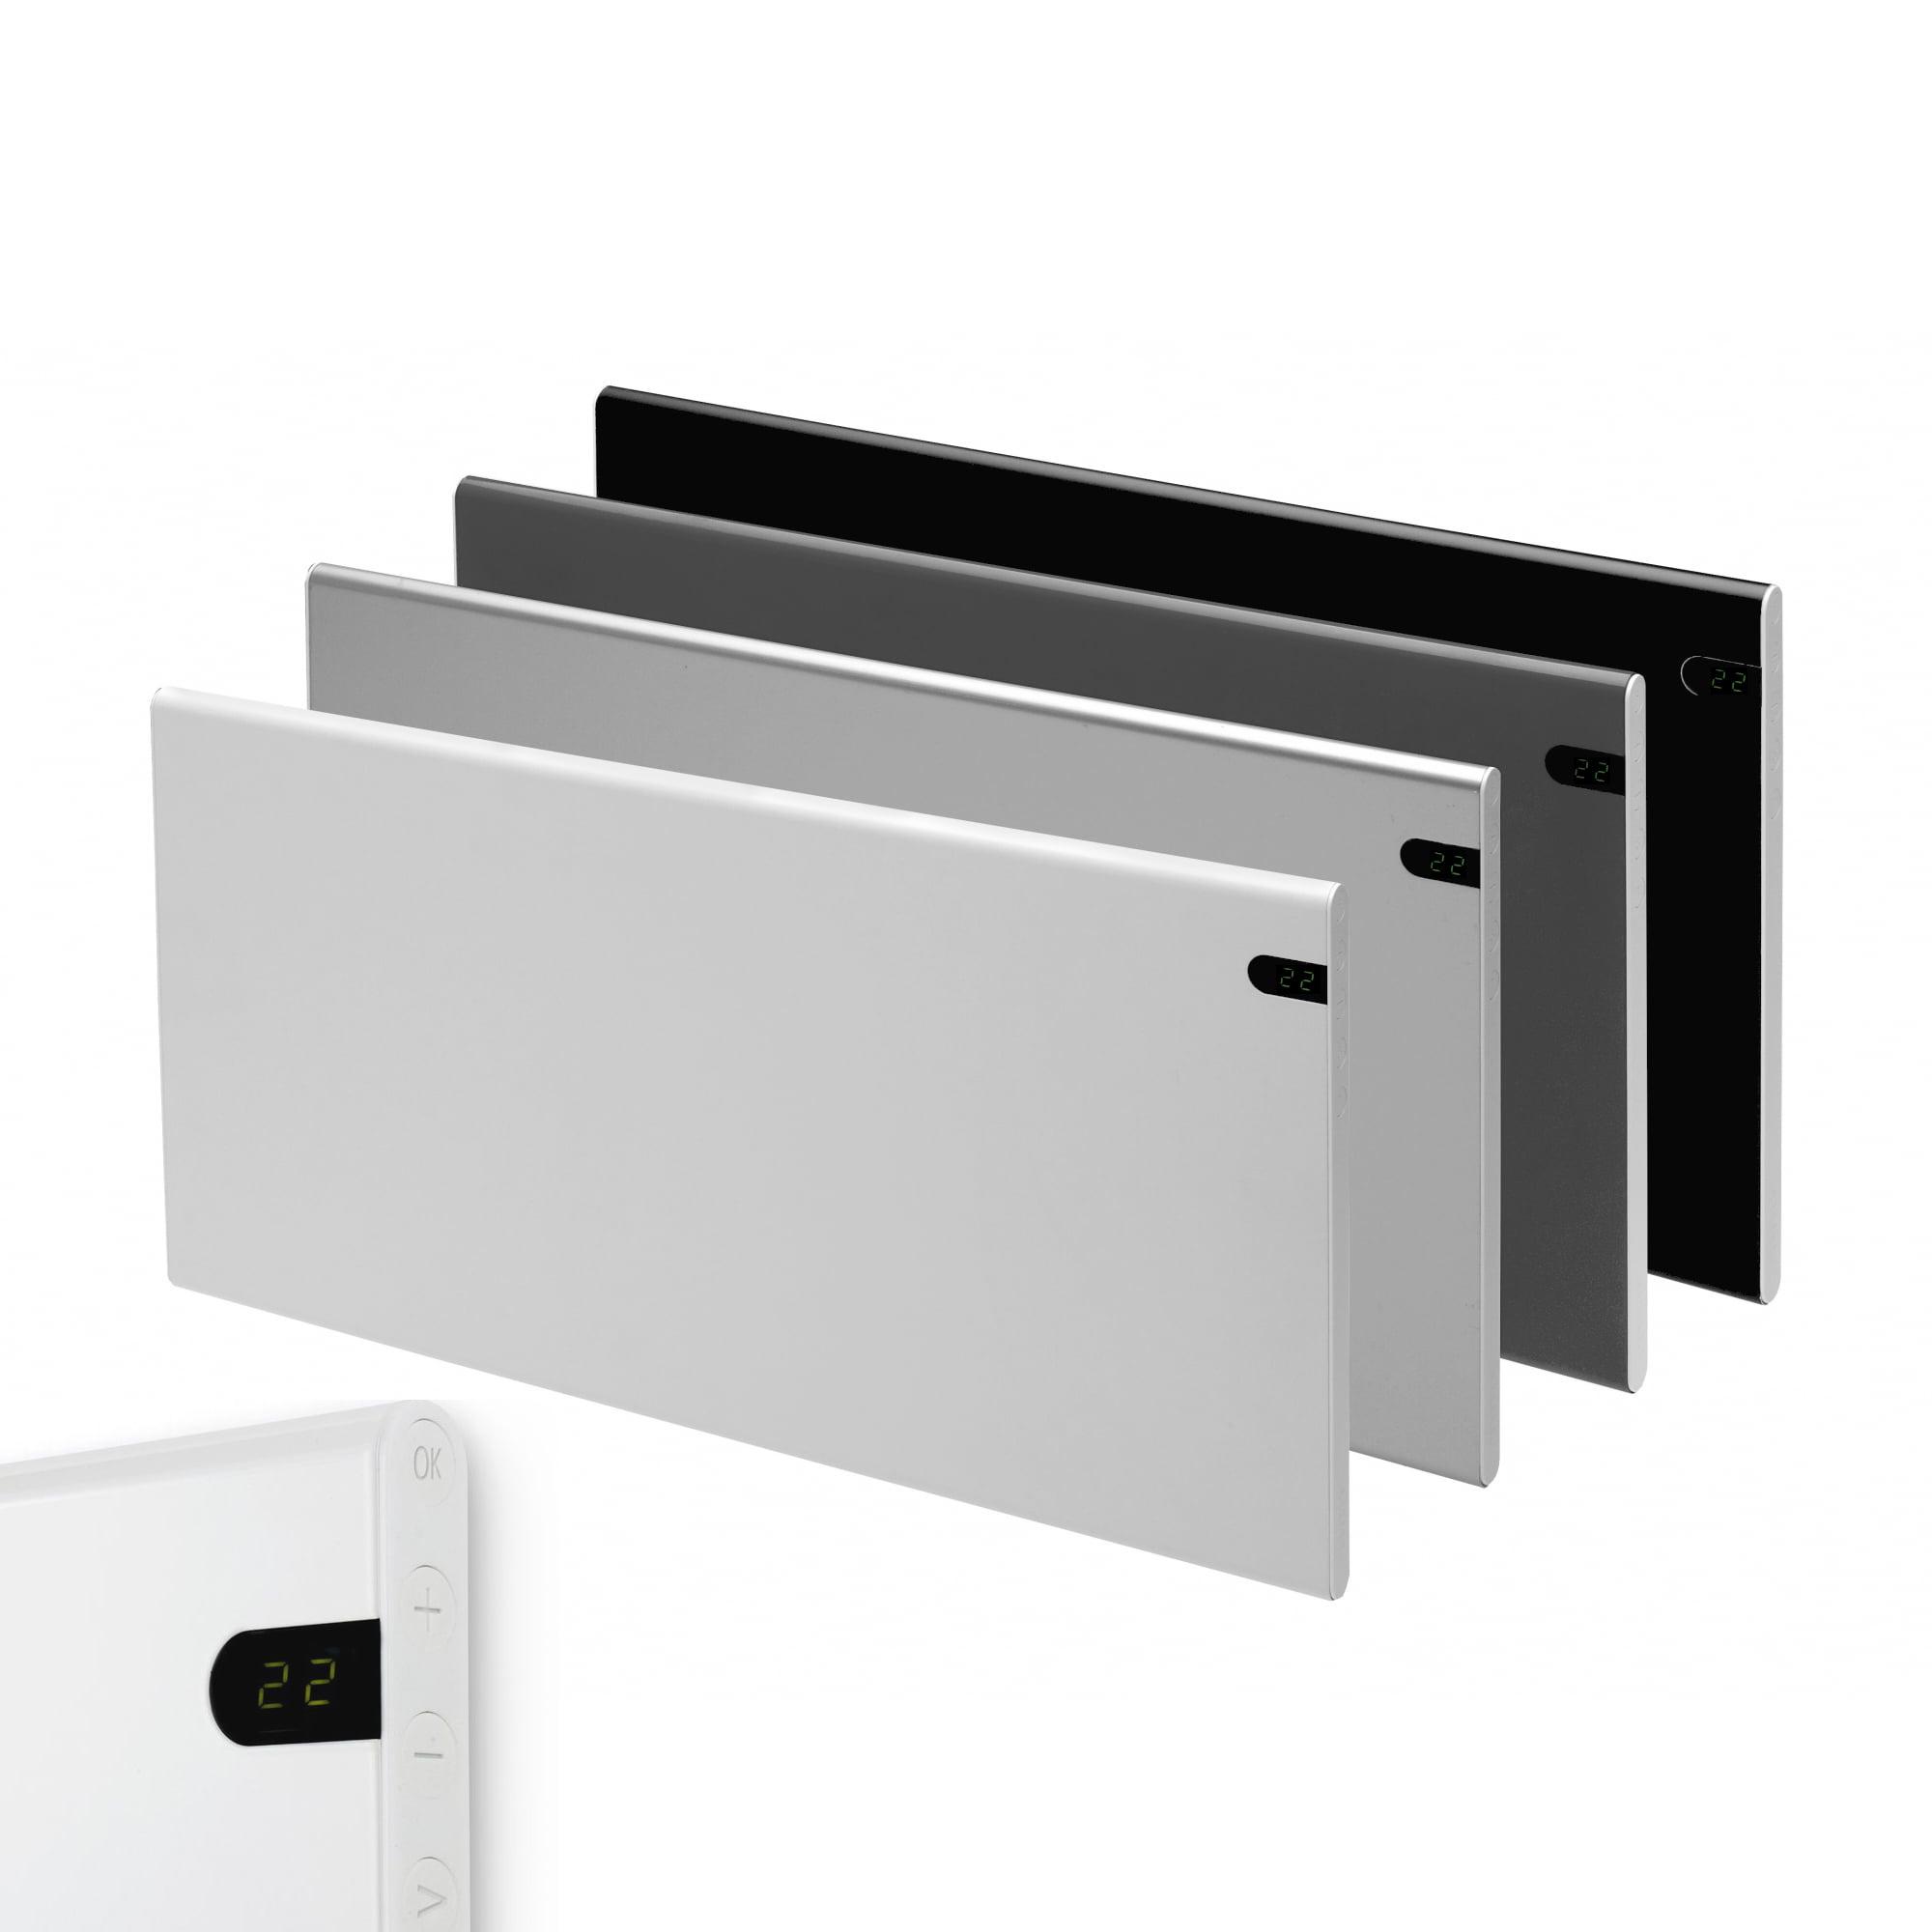 Designer Modern Lava Grey Economic ADAX Neo Smart Wifi Electric Panel Heater//Convector Radiator With Timer 400W Splash Proof Smartphone Control